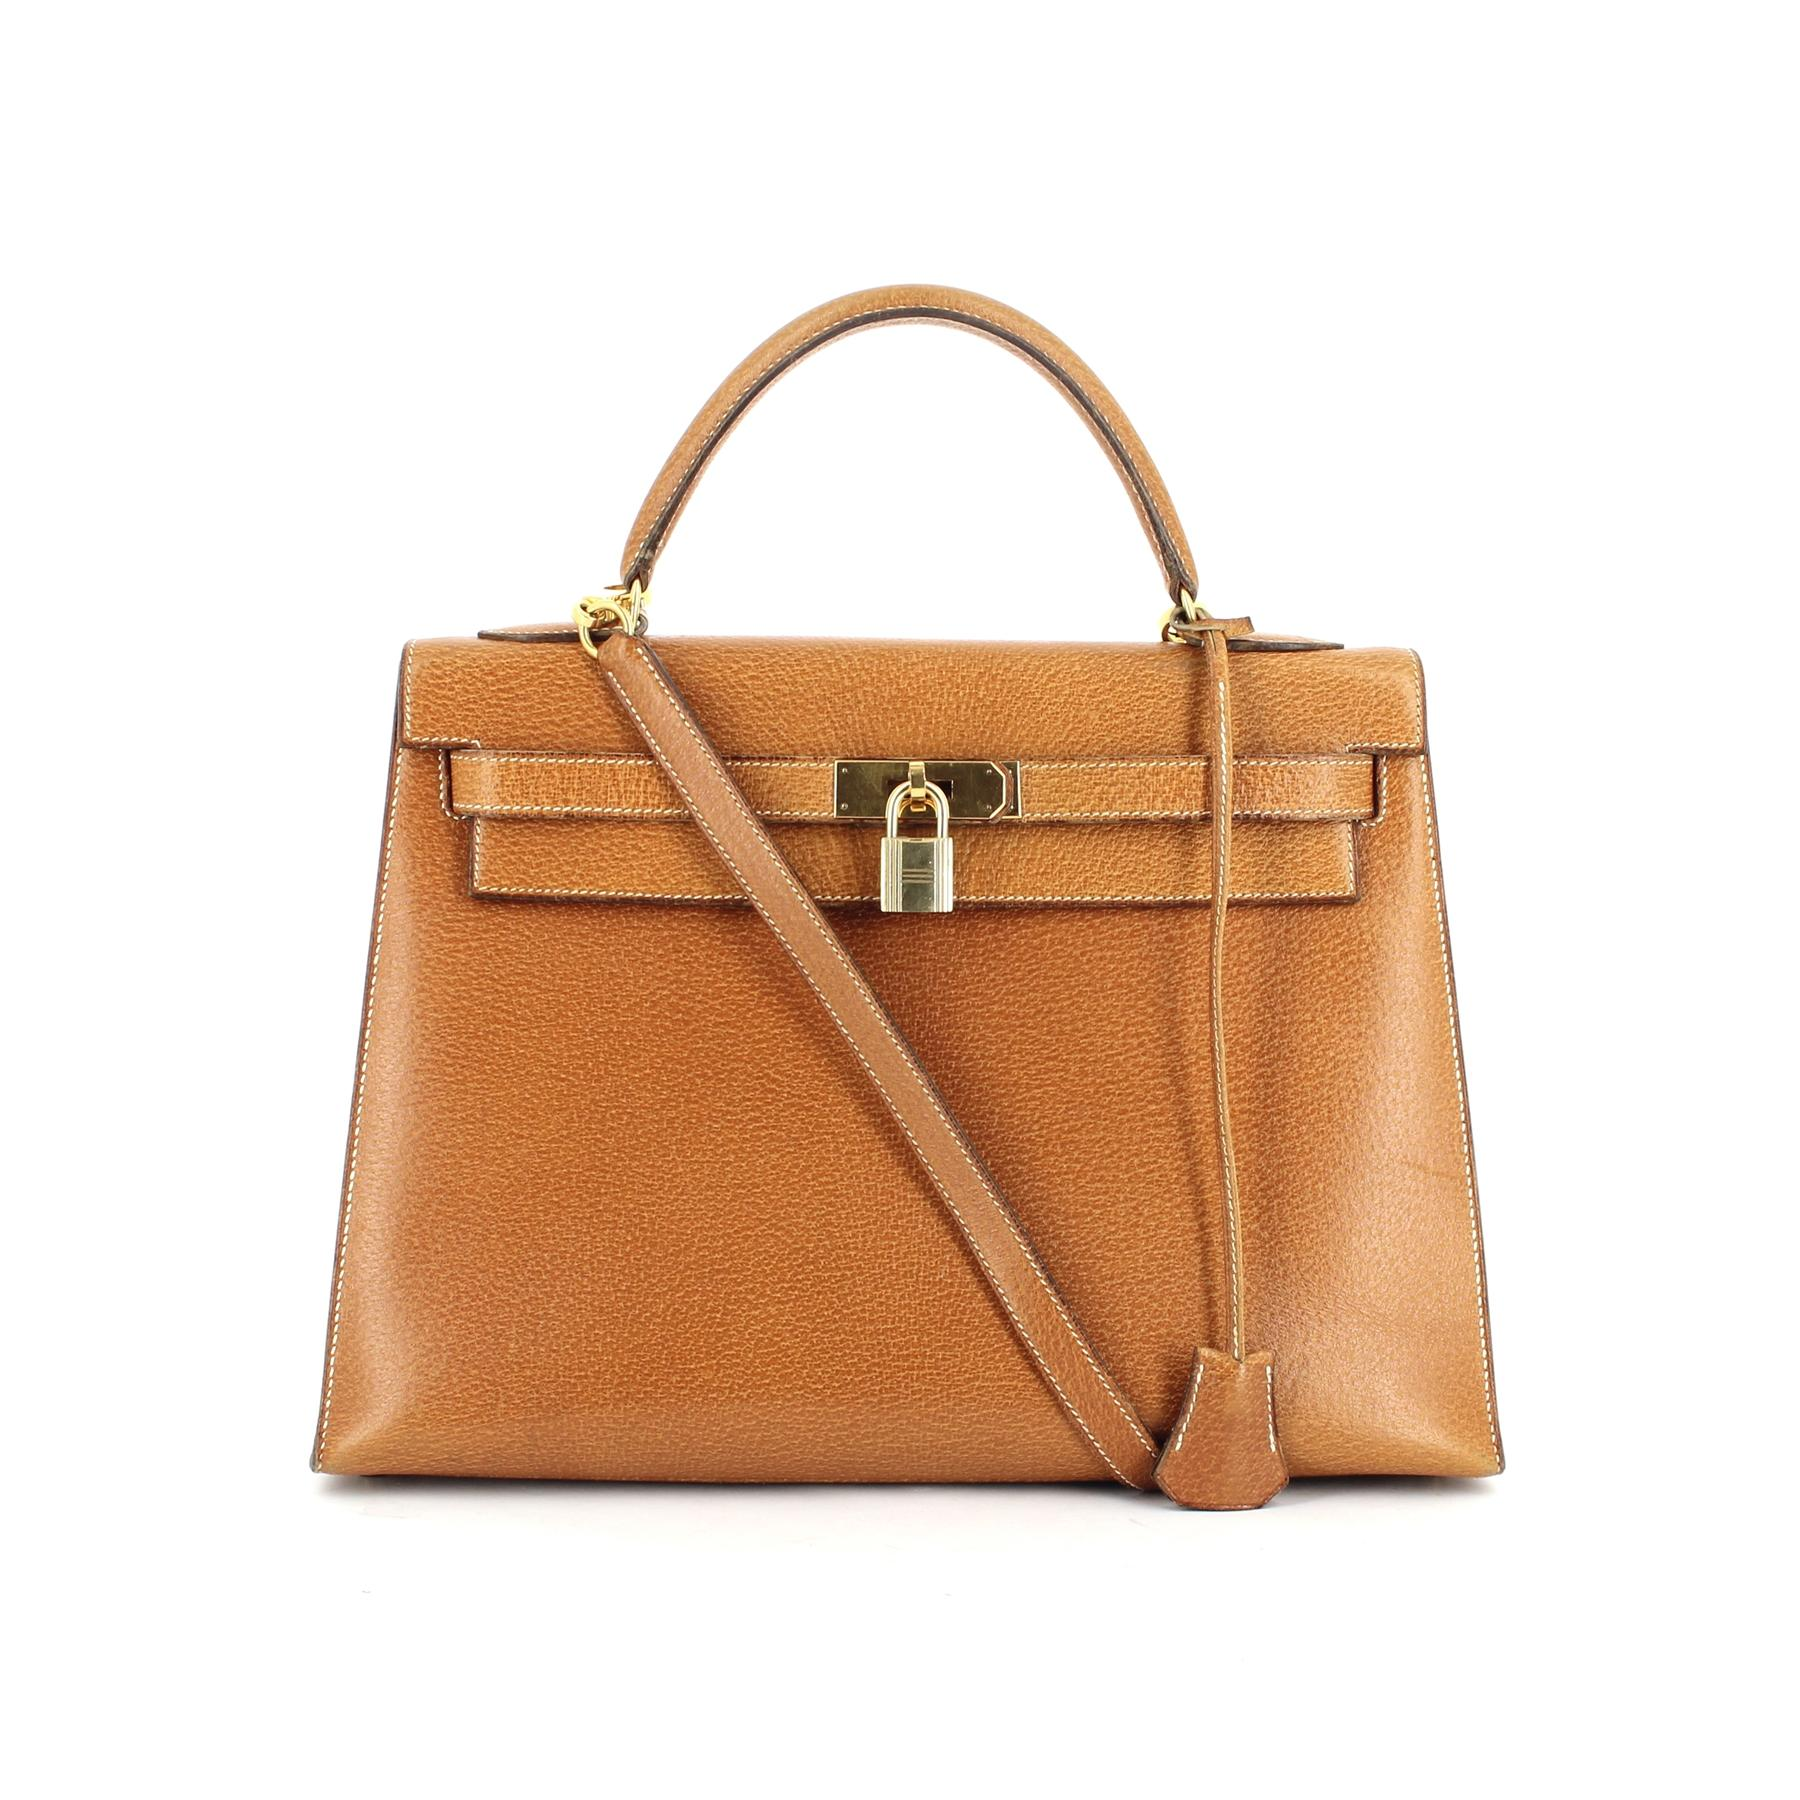 hermes bags replica - Un Kelly pour la vie | Le Figaro Madame